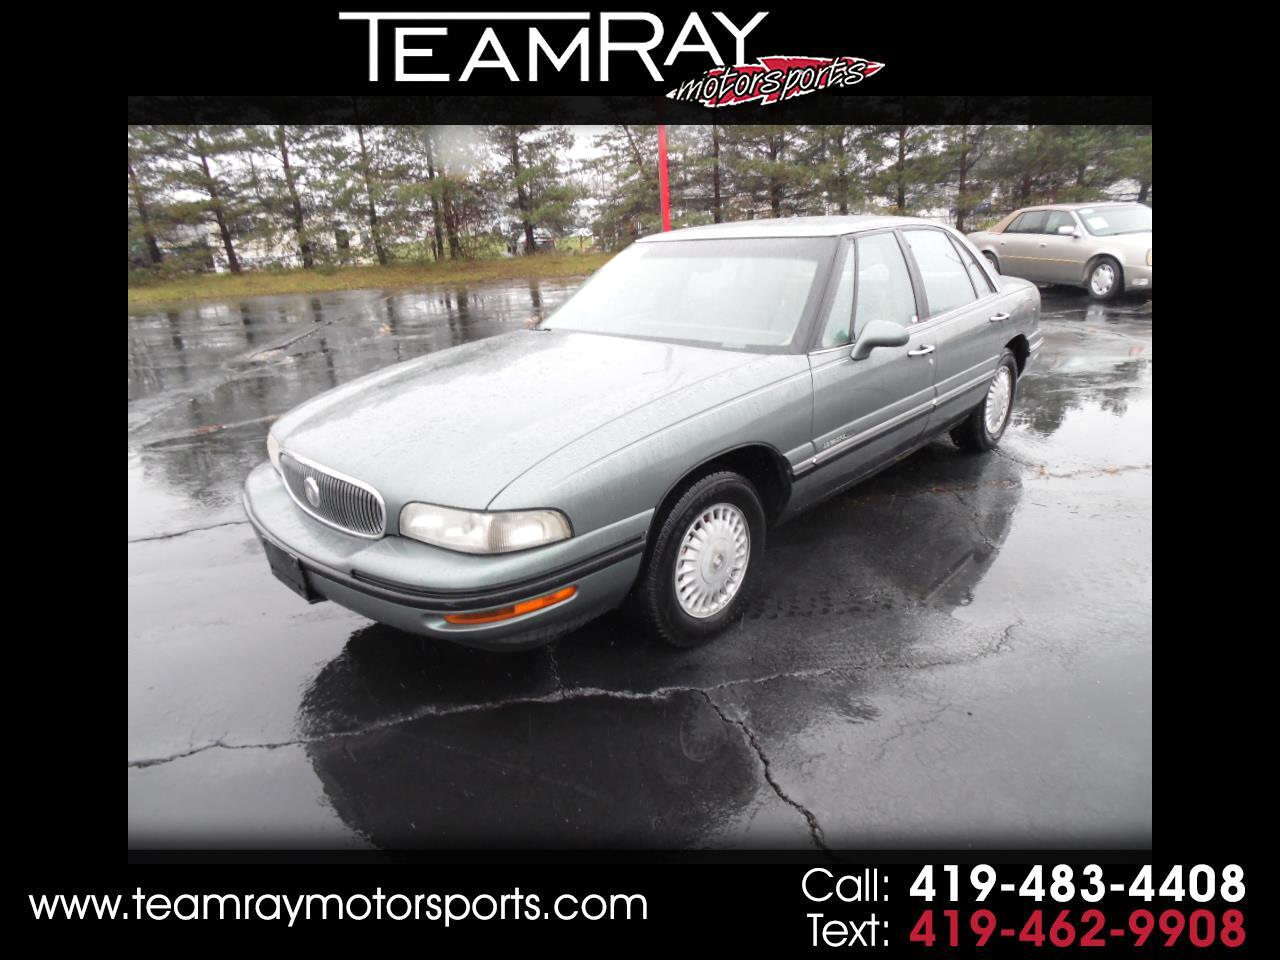 1999 Buick LeSabre 4dr Sdn Custom